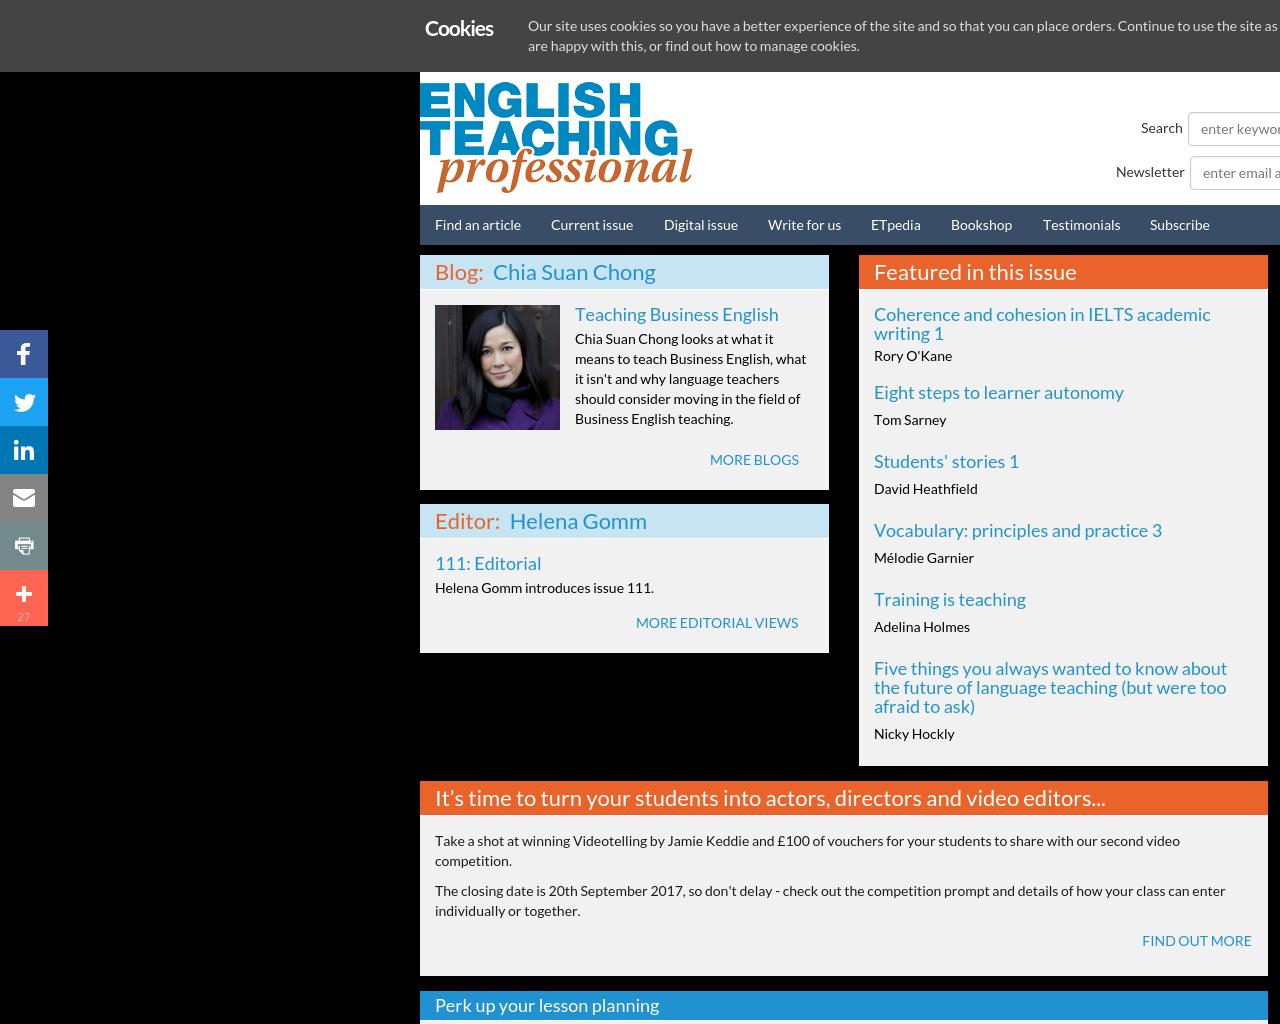 English-Teaching-professional-Advertising-Reviews-Pricing